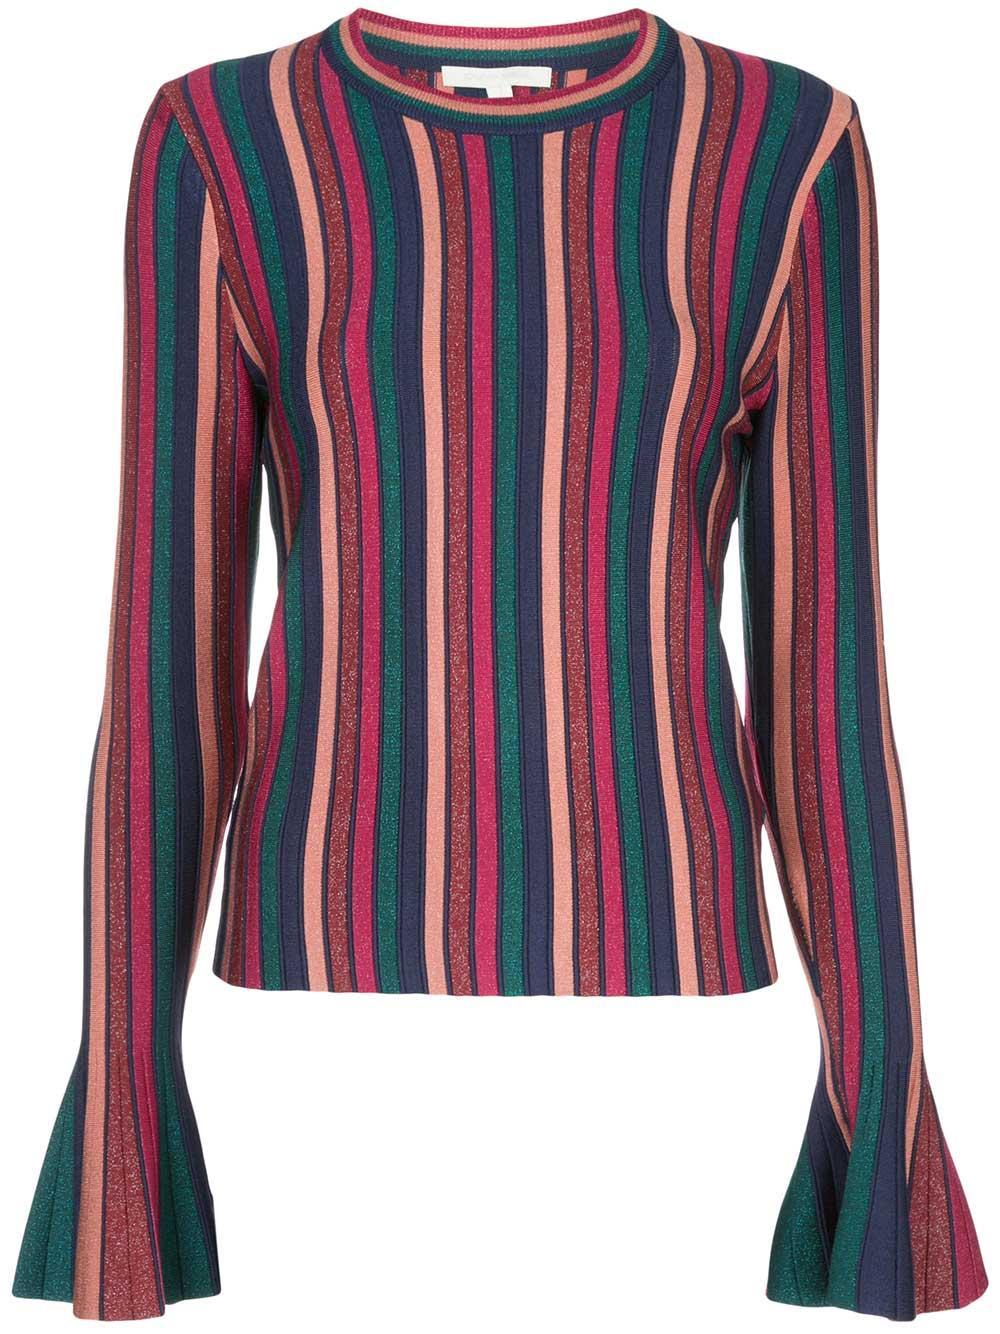 Metallic Stripes Bell Sleeve Top Item # 120-2005-K